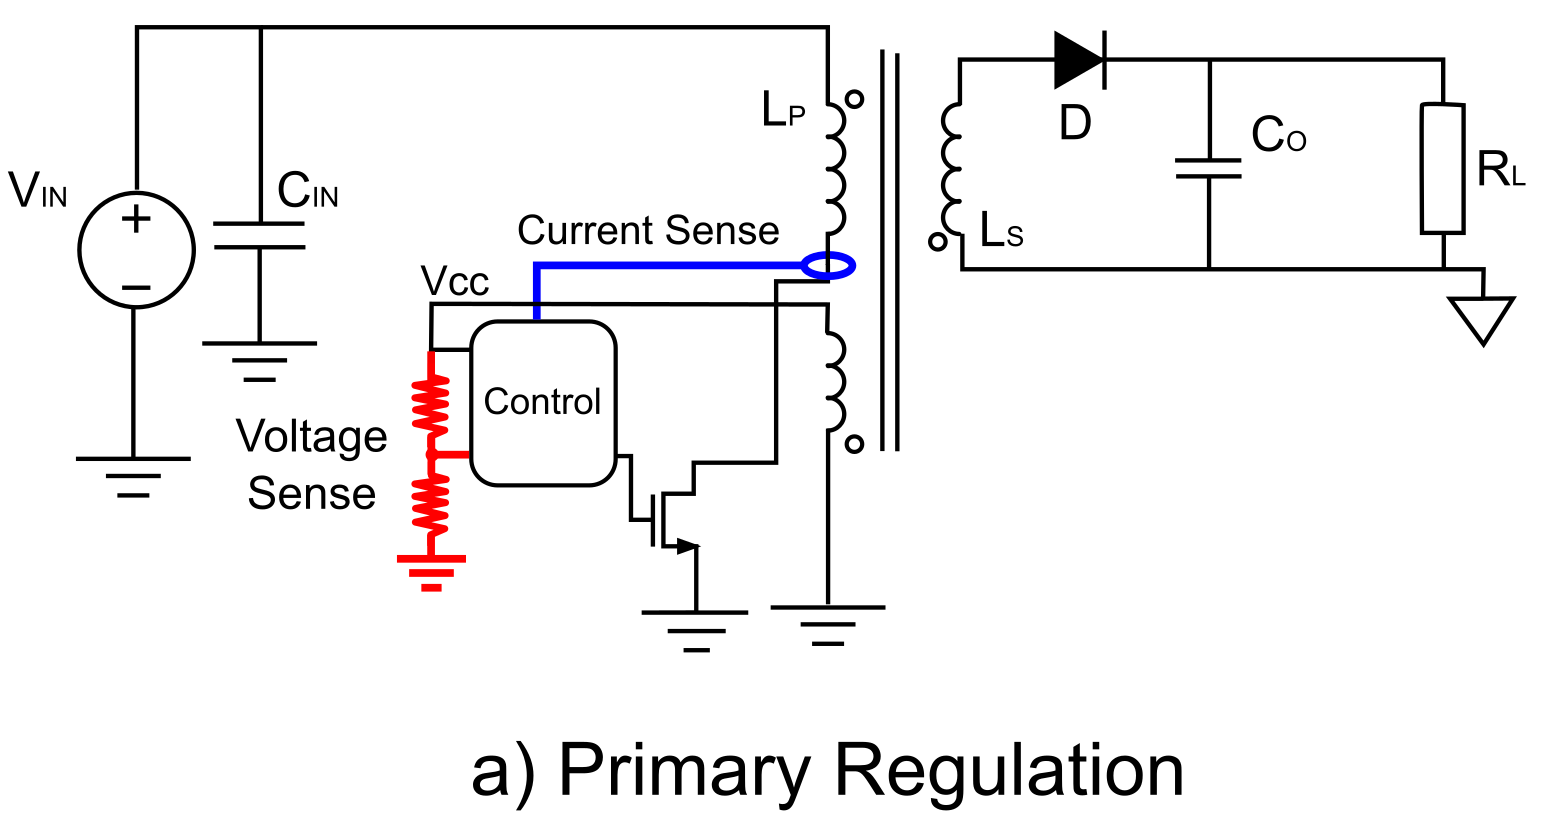 Primary-Side Regulation Circuit Schematic